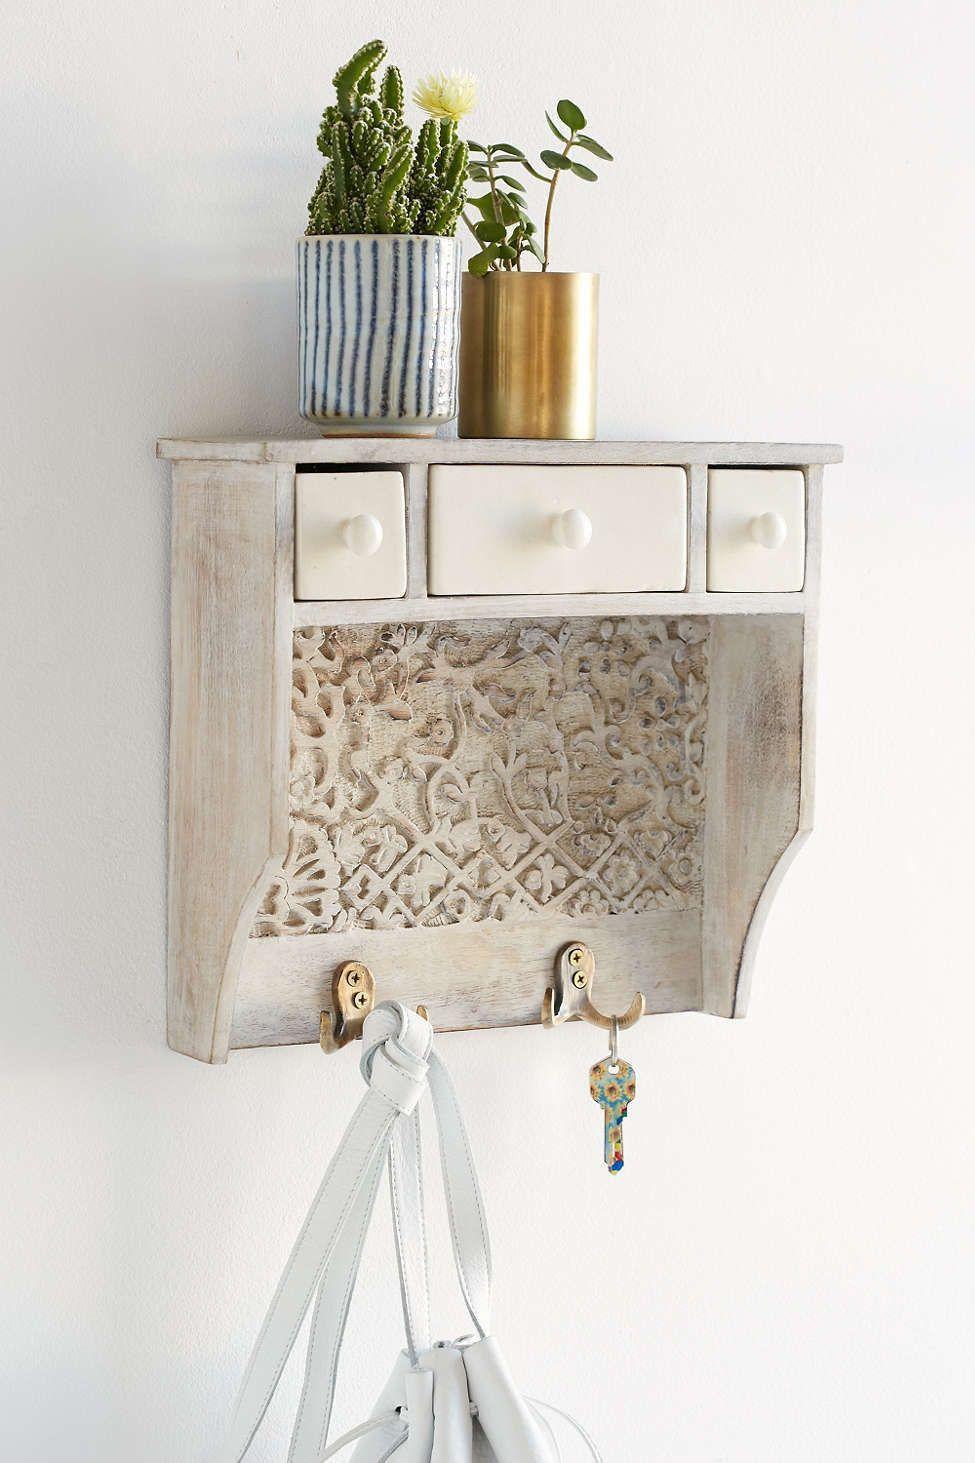 Storage ideas for hallway  Entryway Vessels To Catch All Your Stuff  Hallway Storage Ideas